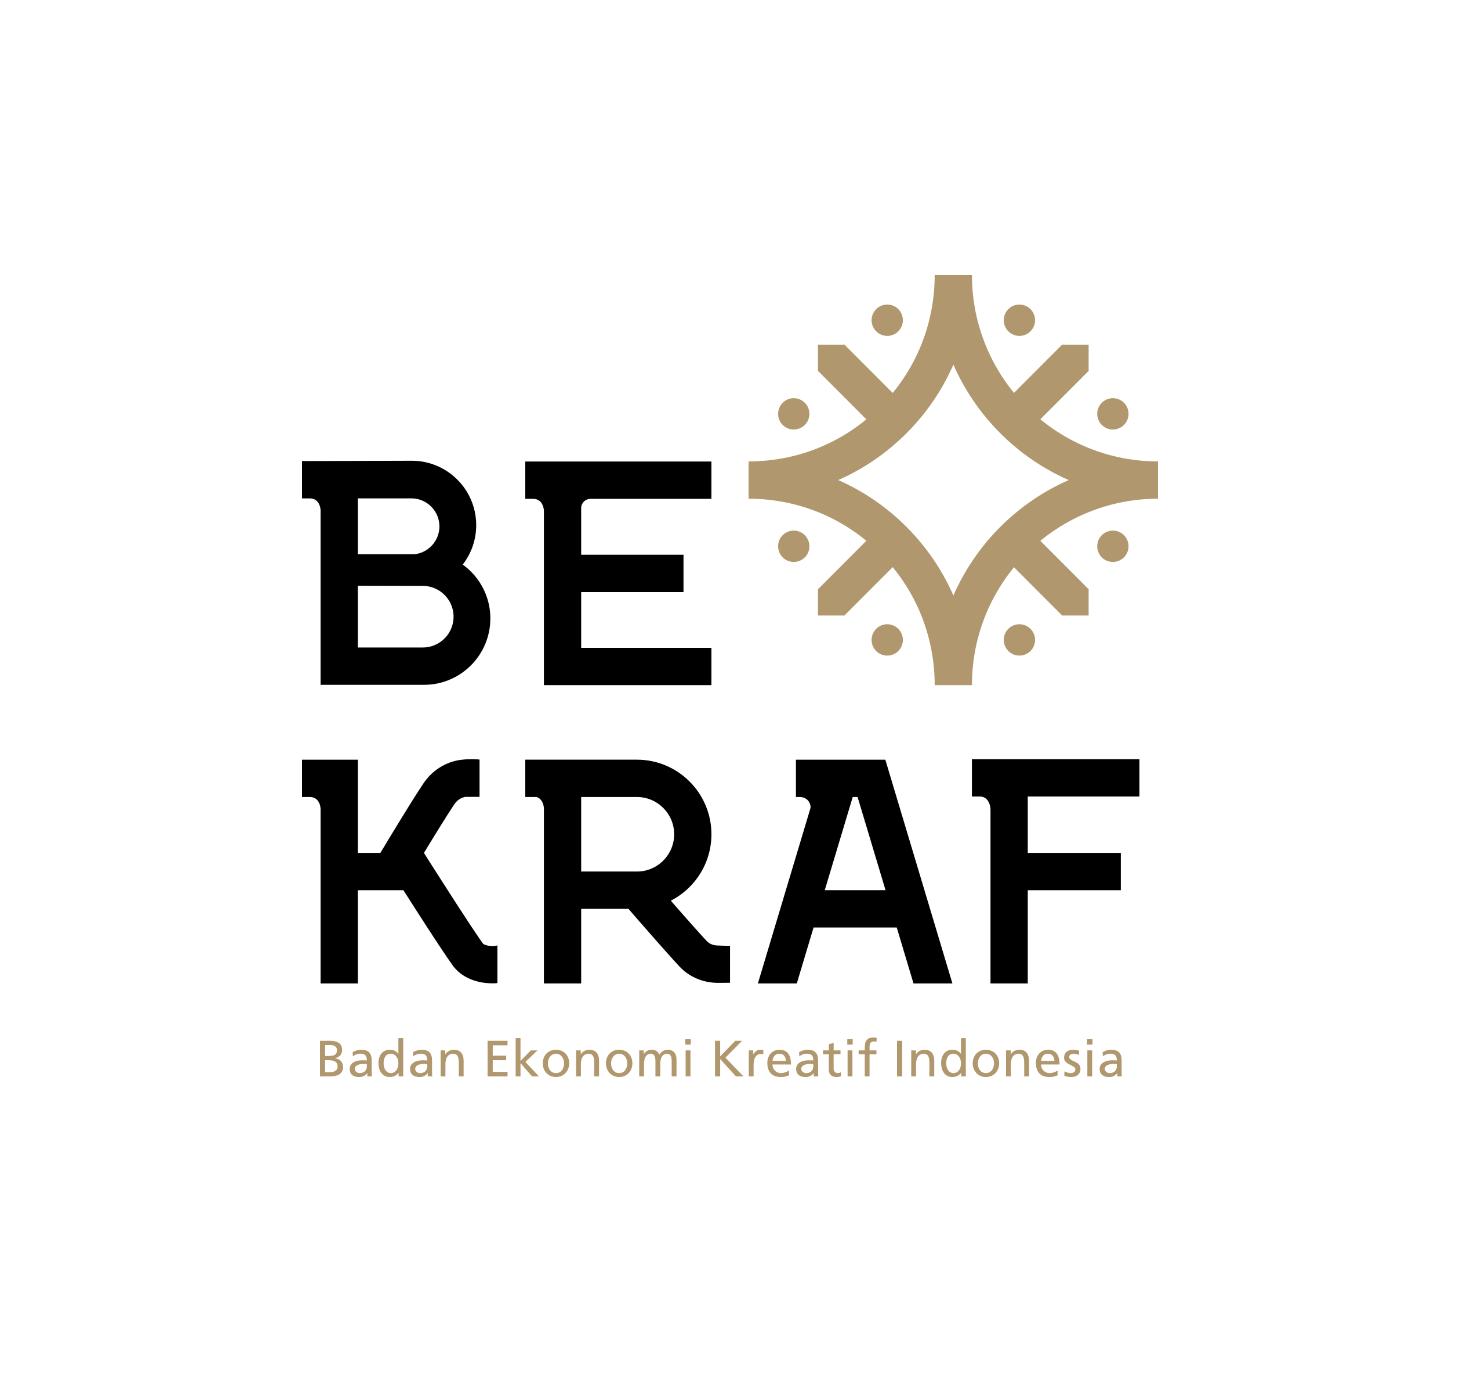 Workshop BDD Malang 2019 - Amazon Web Services